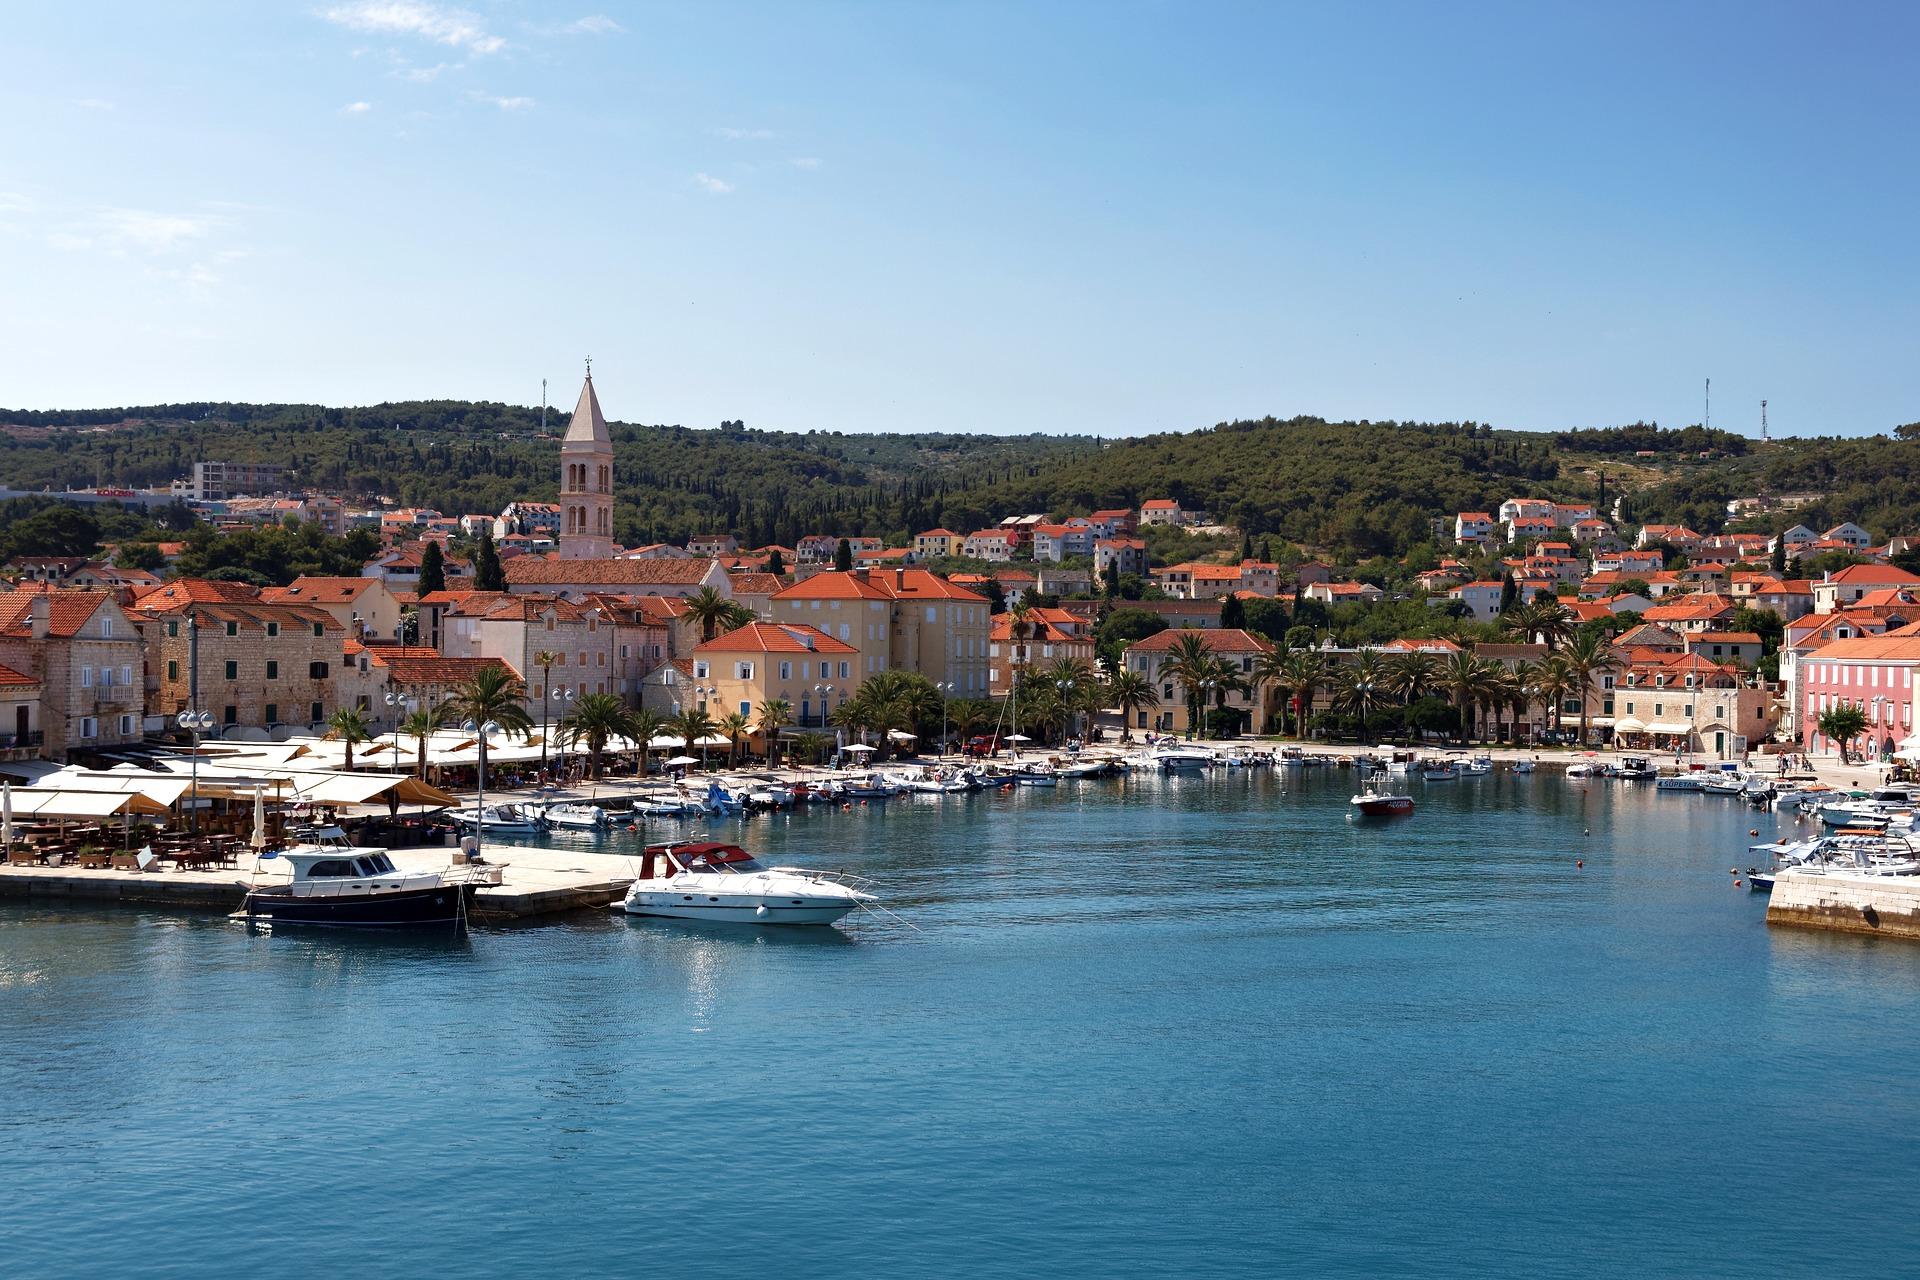 wp-content/uploads/itineraries/Croatia/croatia-hvar-1.jpg